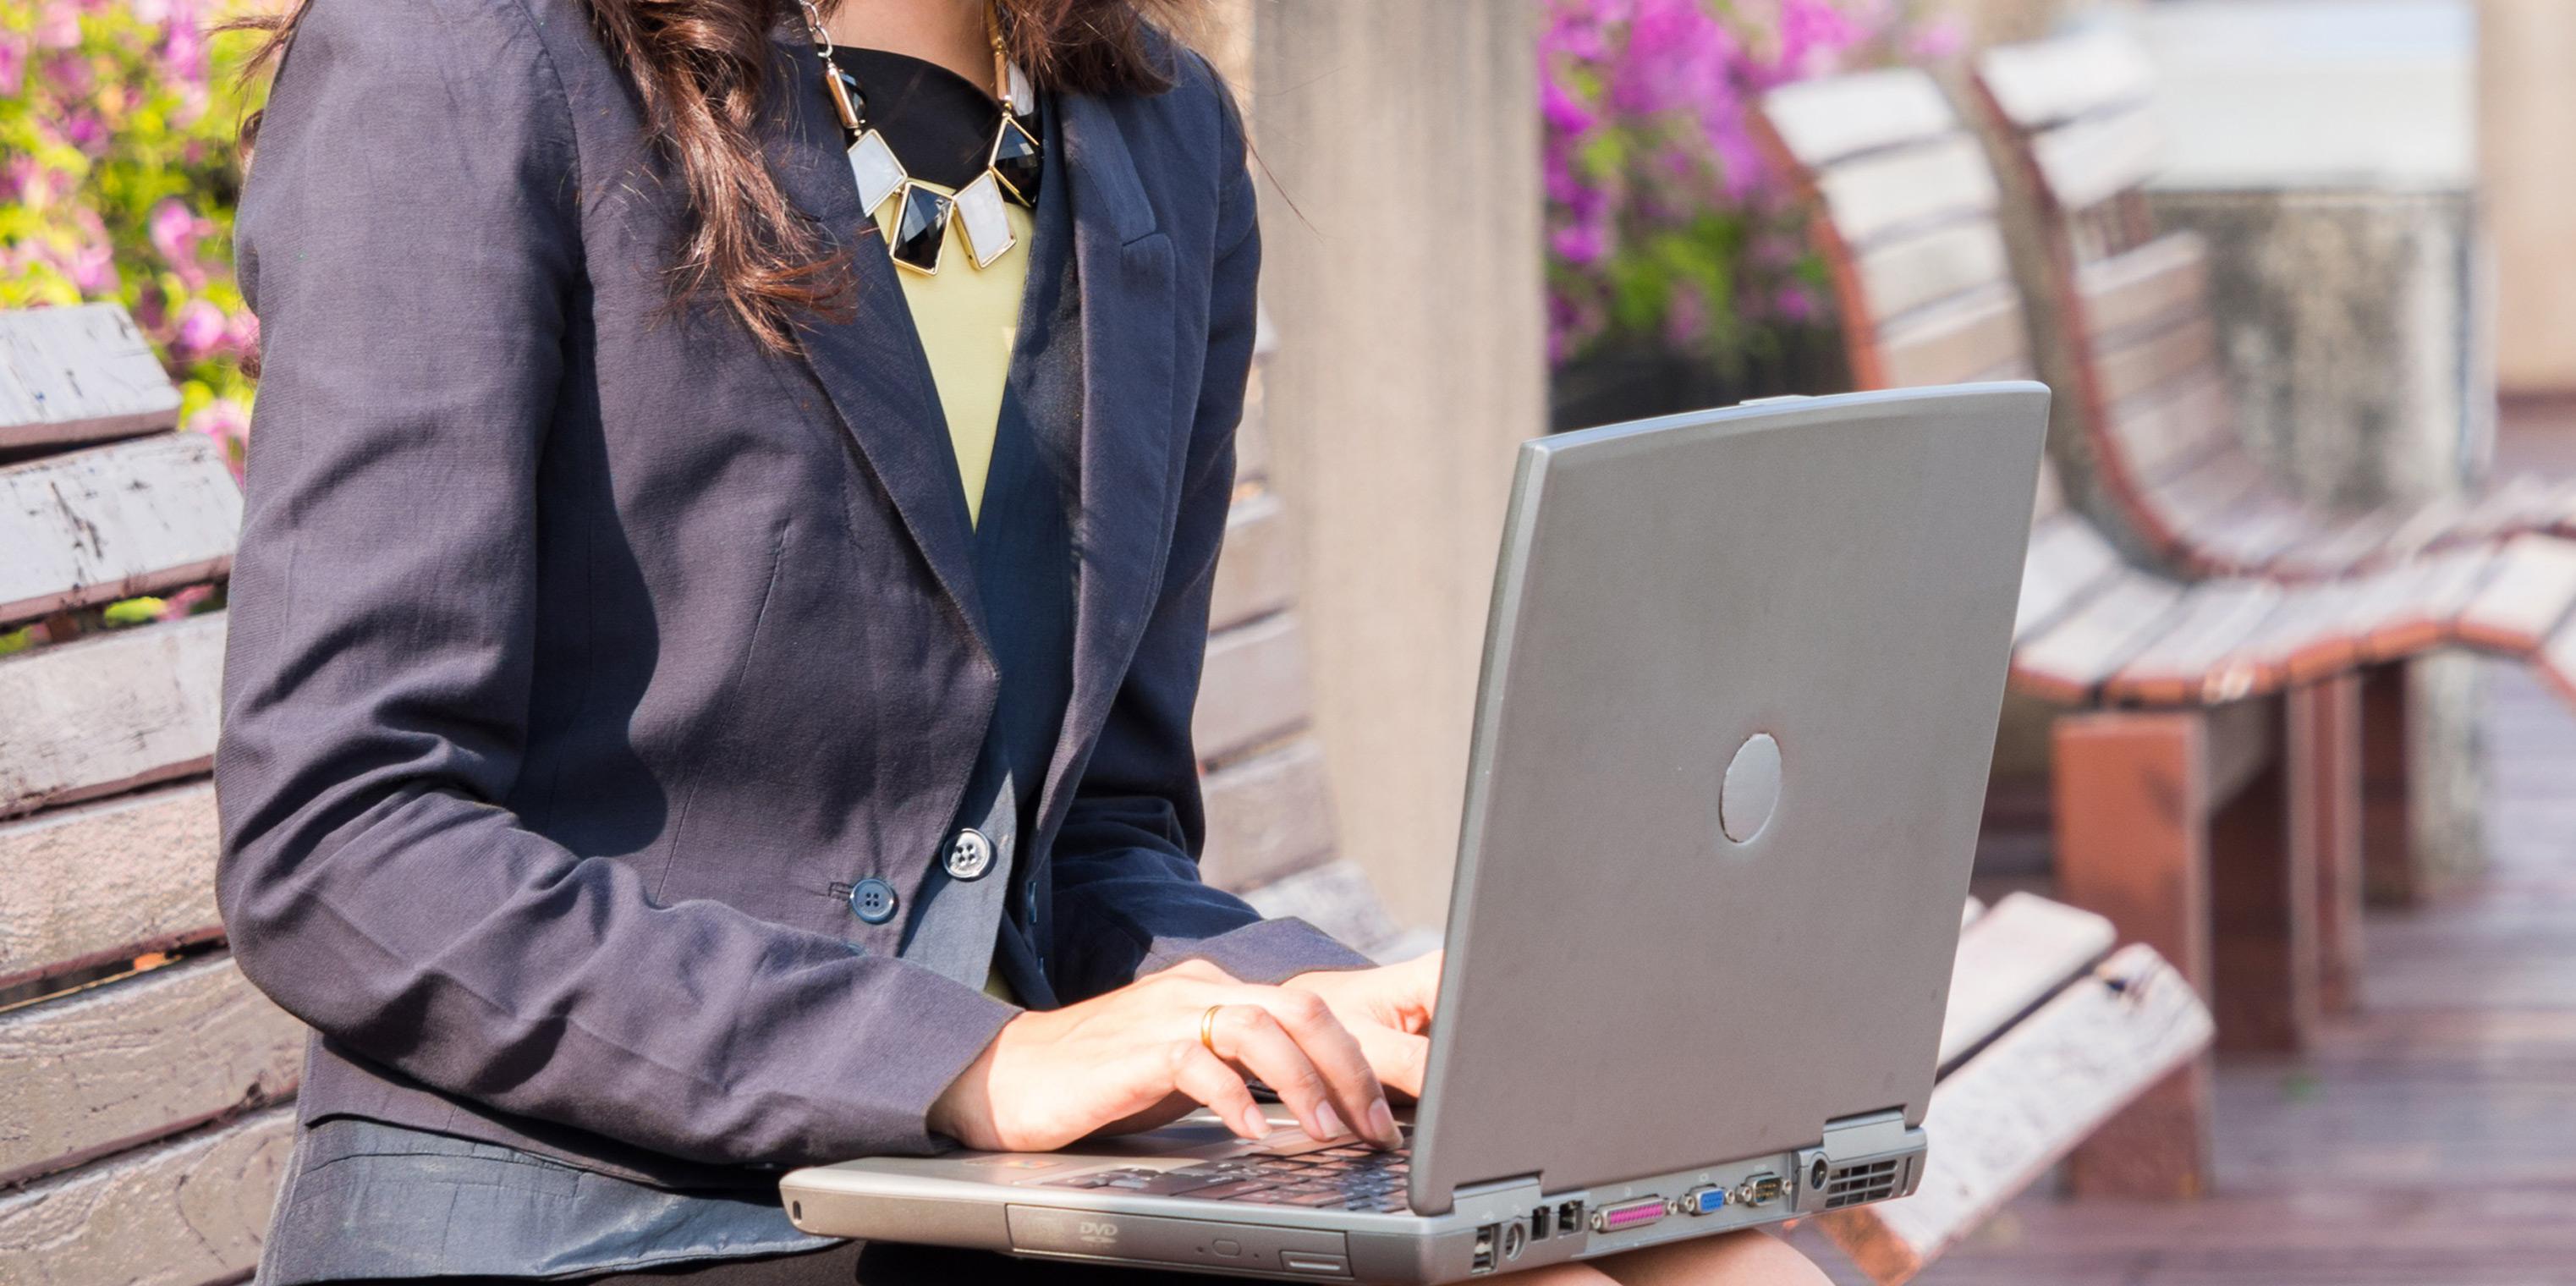 Bloggsamarbeten